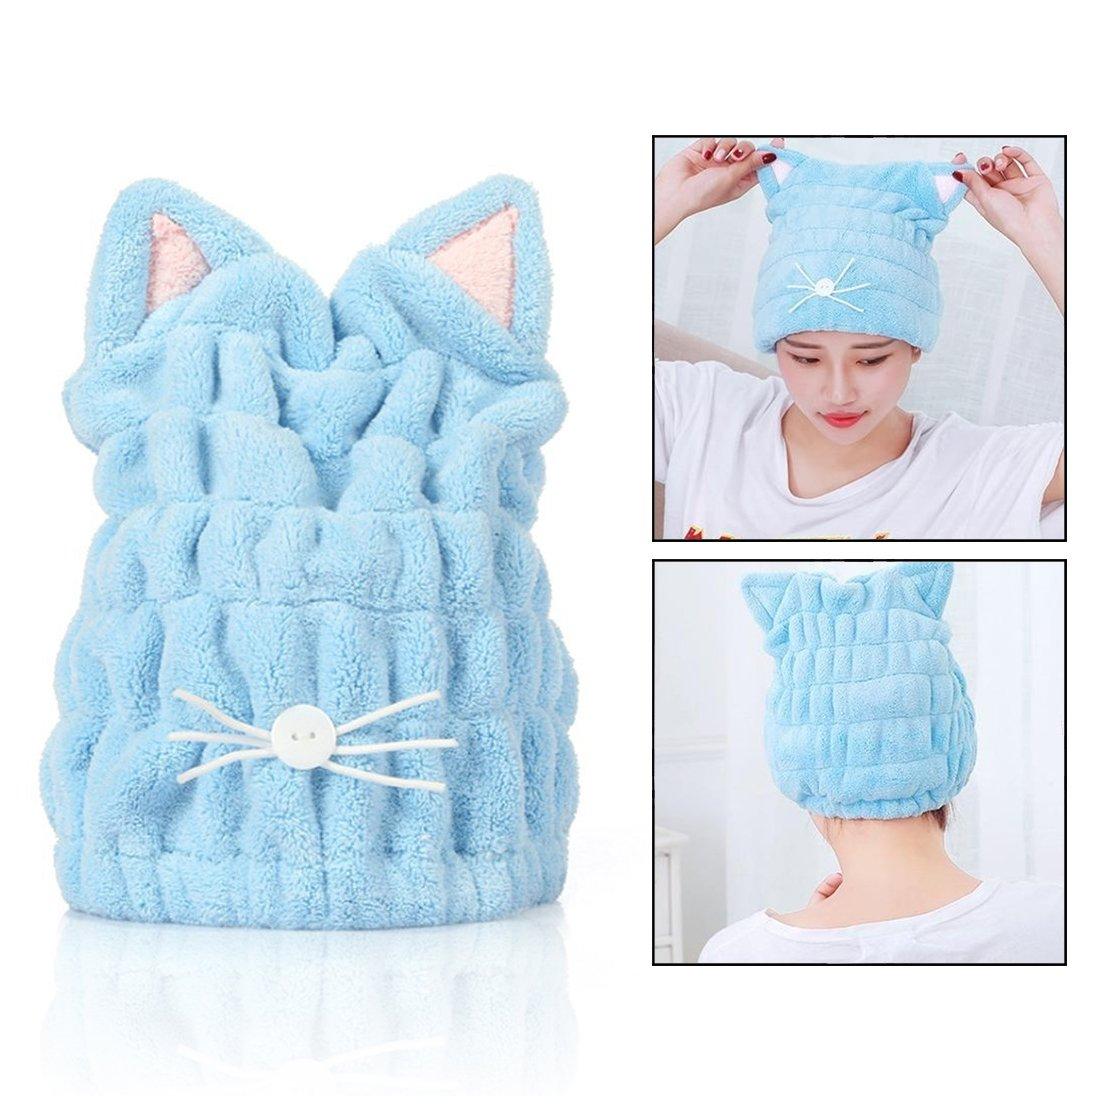 OFKPO Adjustable Microfiber Cute Cartoon Cat Hair Quick Drying Bath Cap,Ultra-Soft Hair Wrap,Bath Hair Hat, Reduce Hair Drying Time for Anyone.(Blue)